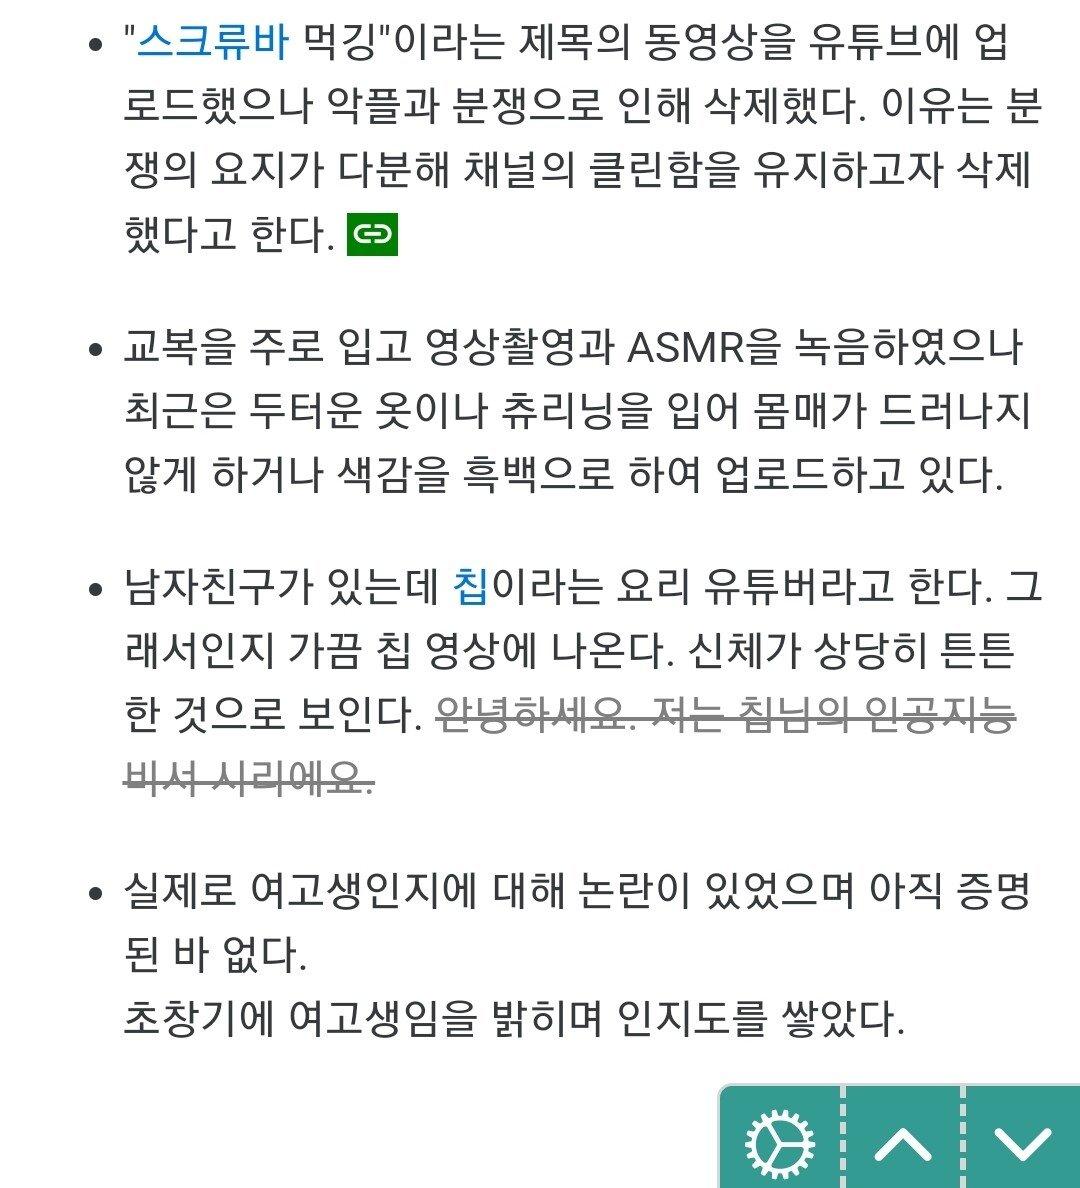 Screenshot_20200806-175202_Samsung Internet.jpg 유튜버 칩 뒷광고 사실 인정. jpg (asmr 지읒 남친)